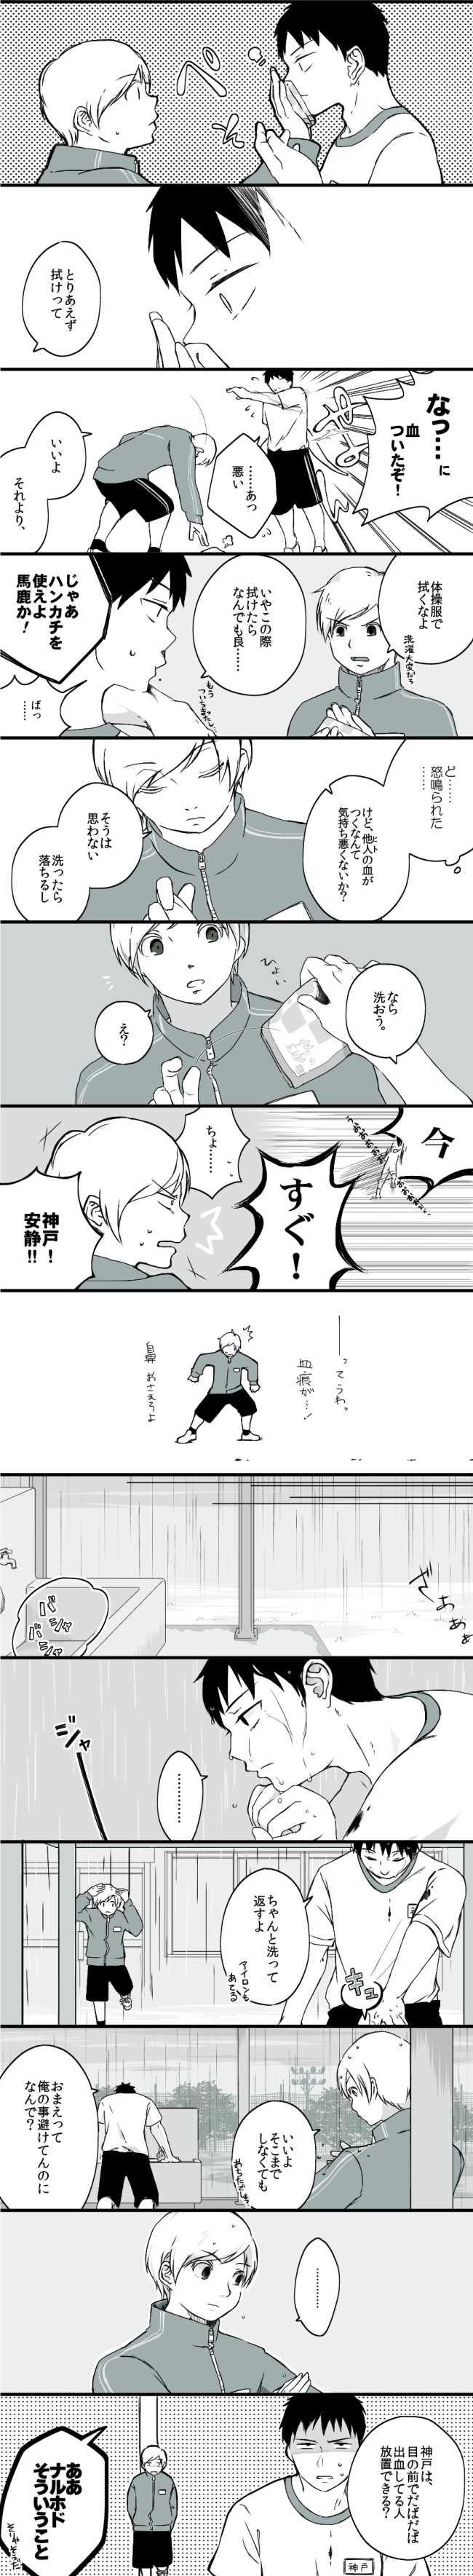 14. 雨天の乙女座